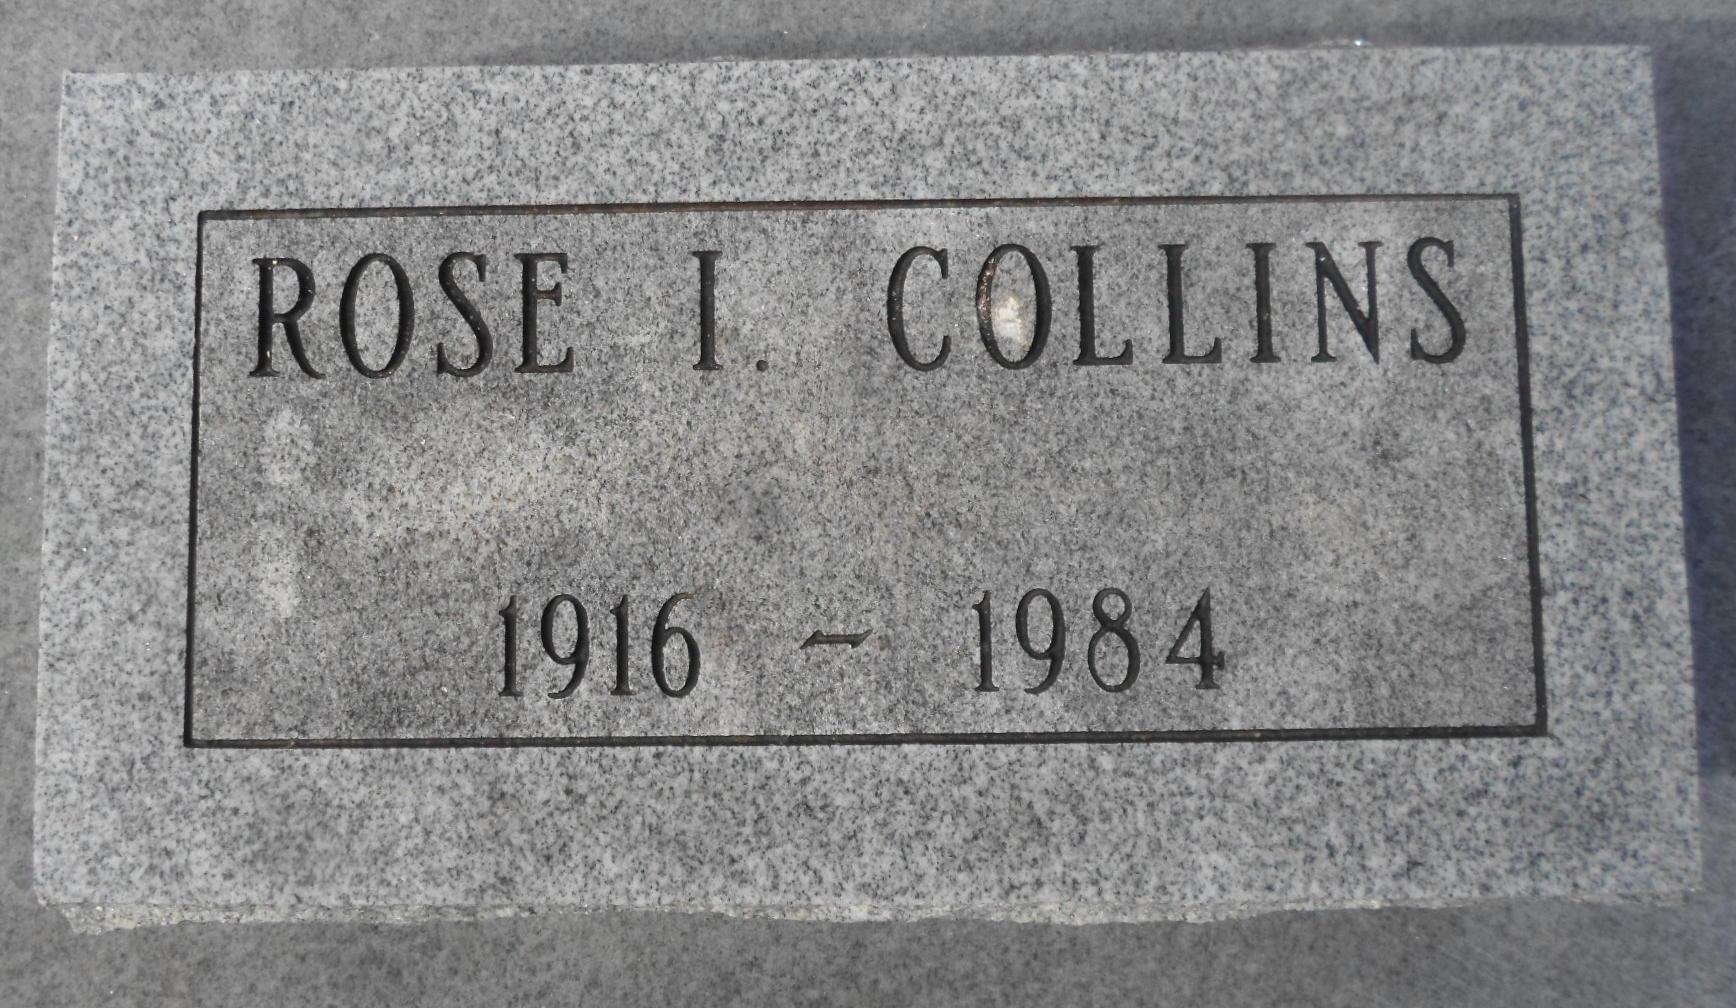 Rose Irene Collins